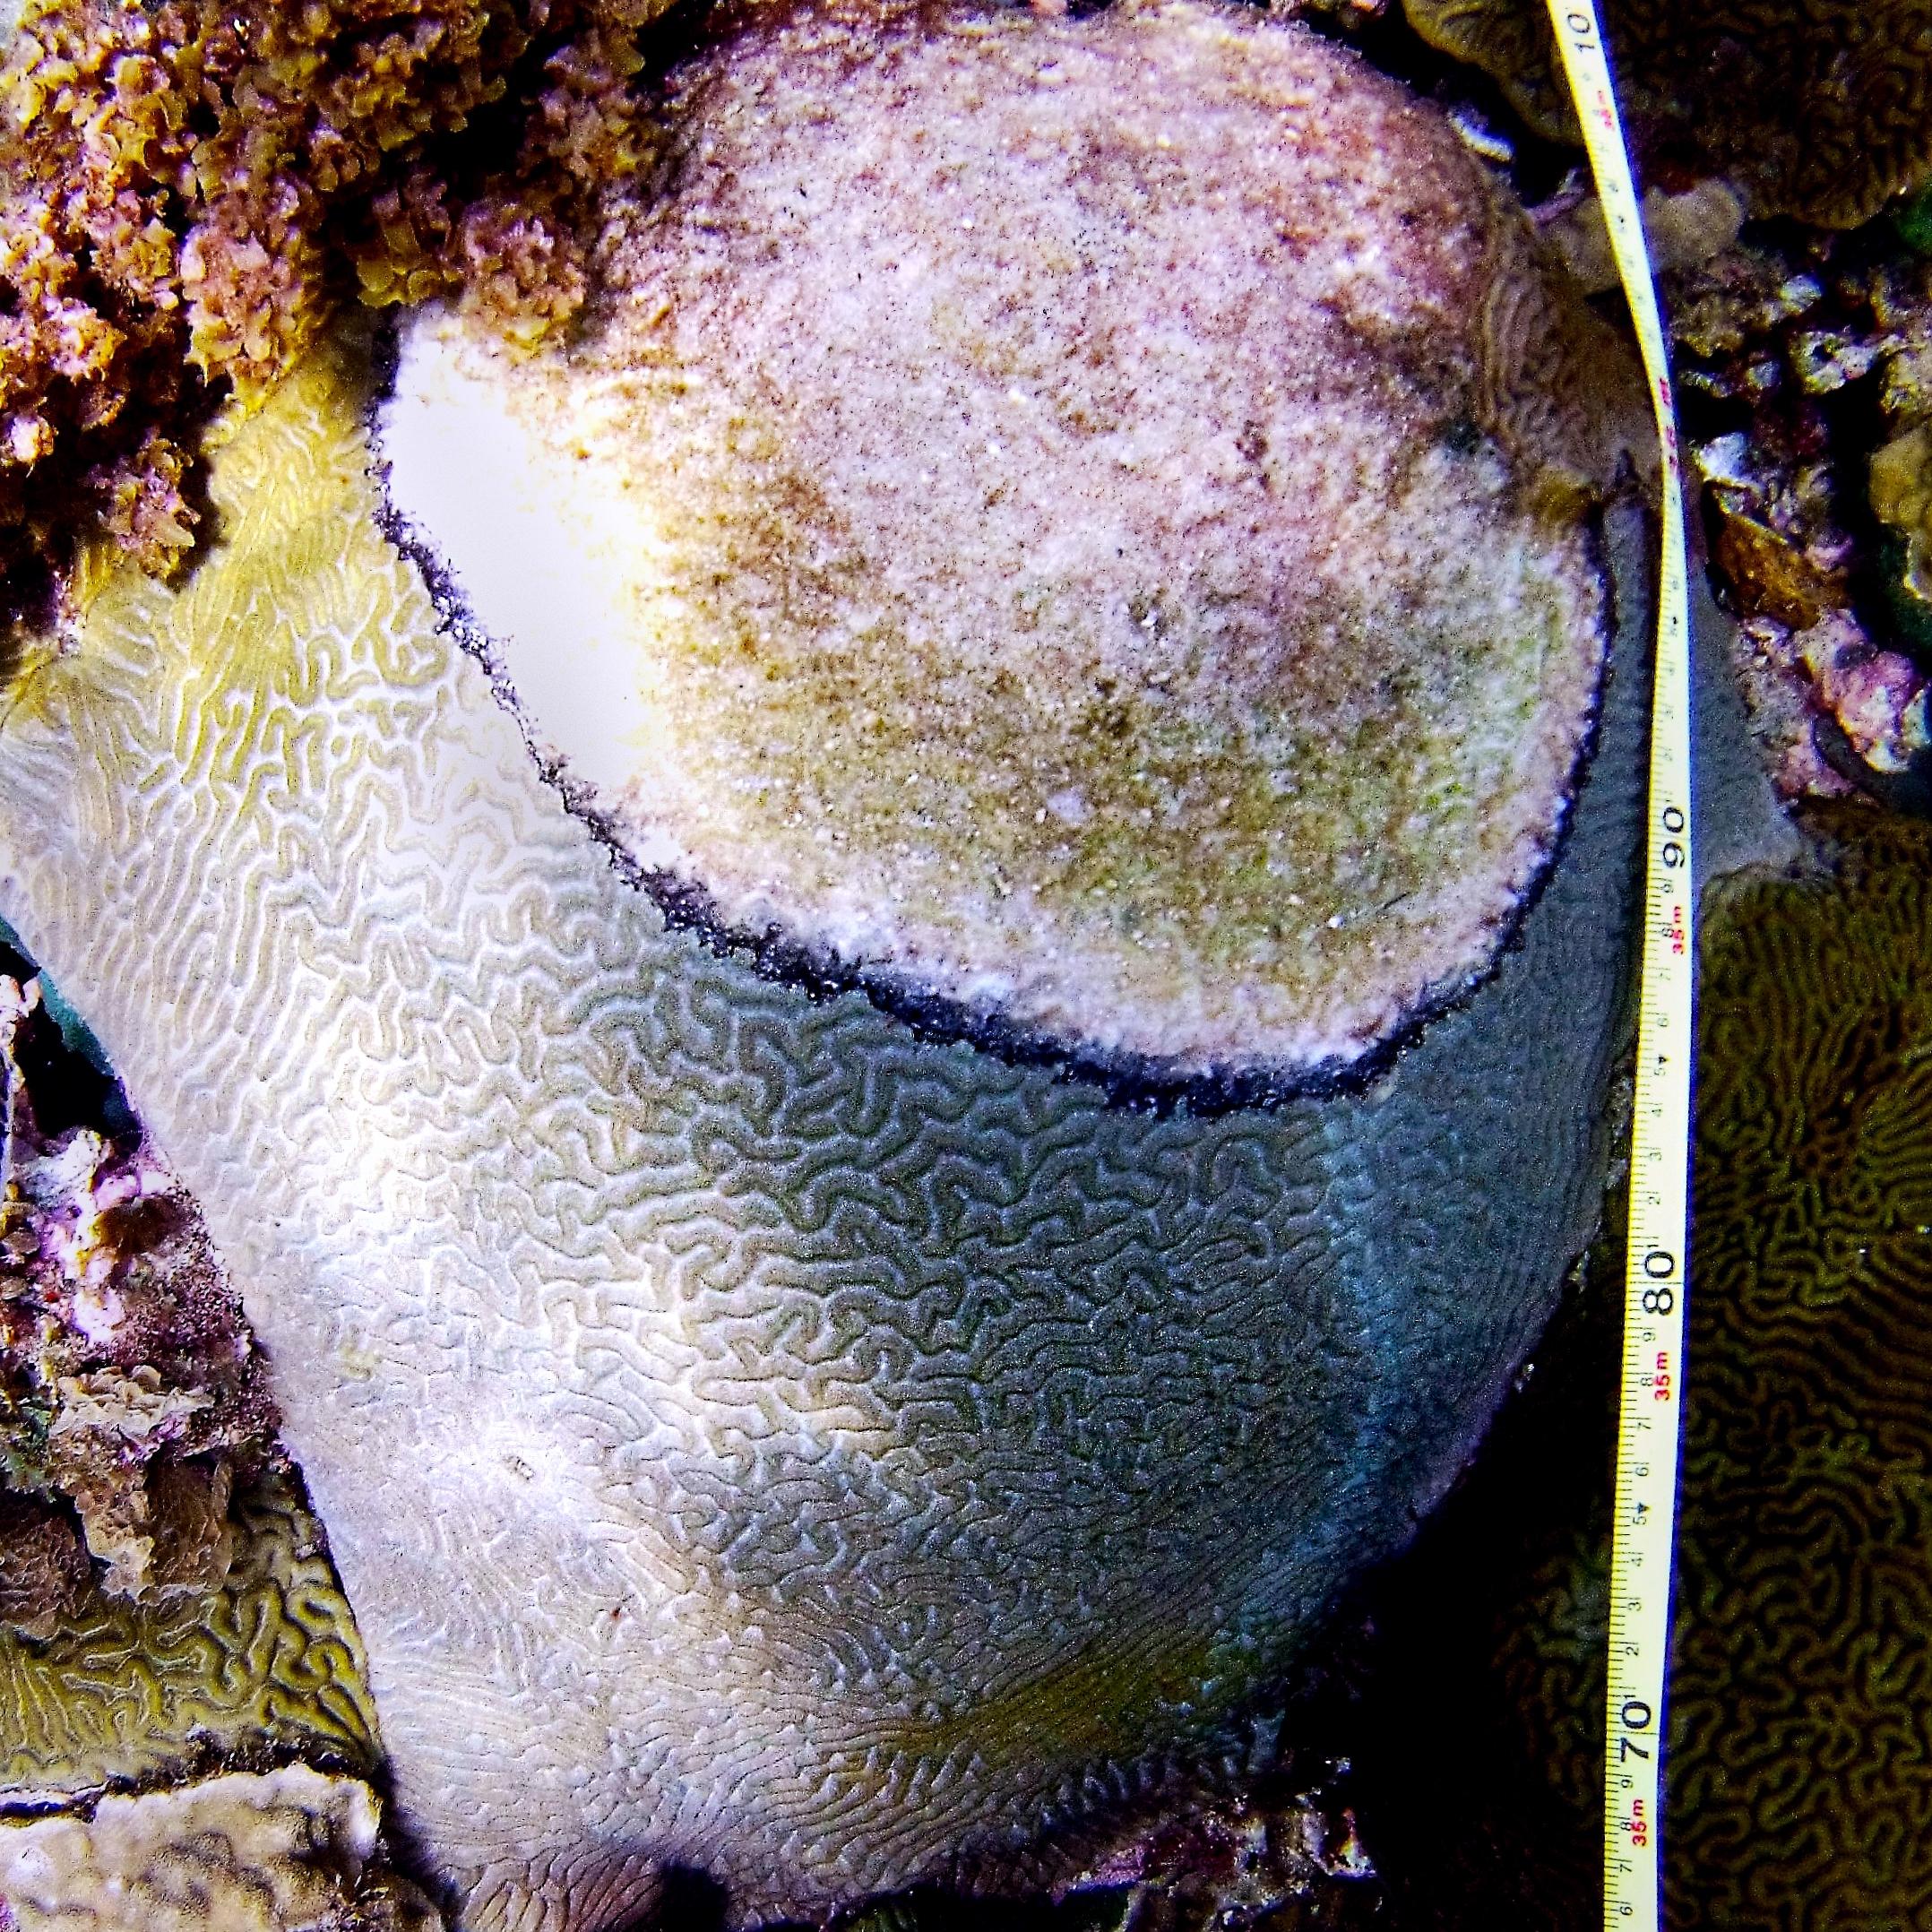 coral health & disease in bocas del toro, panama -